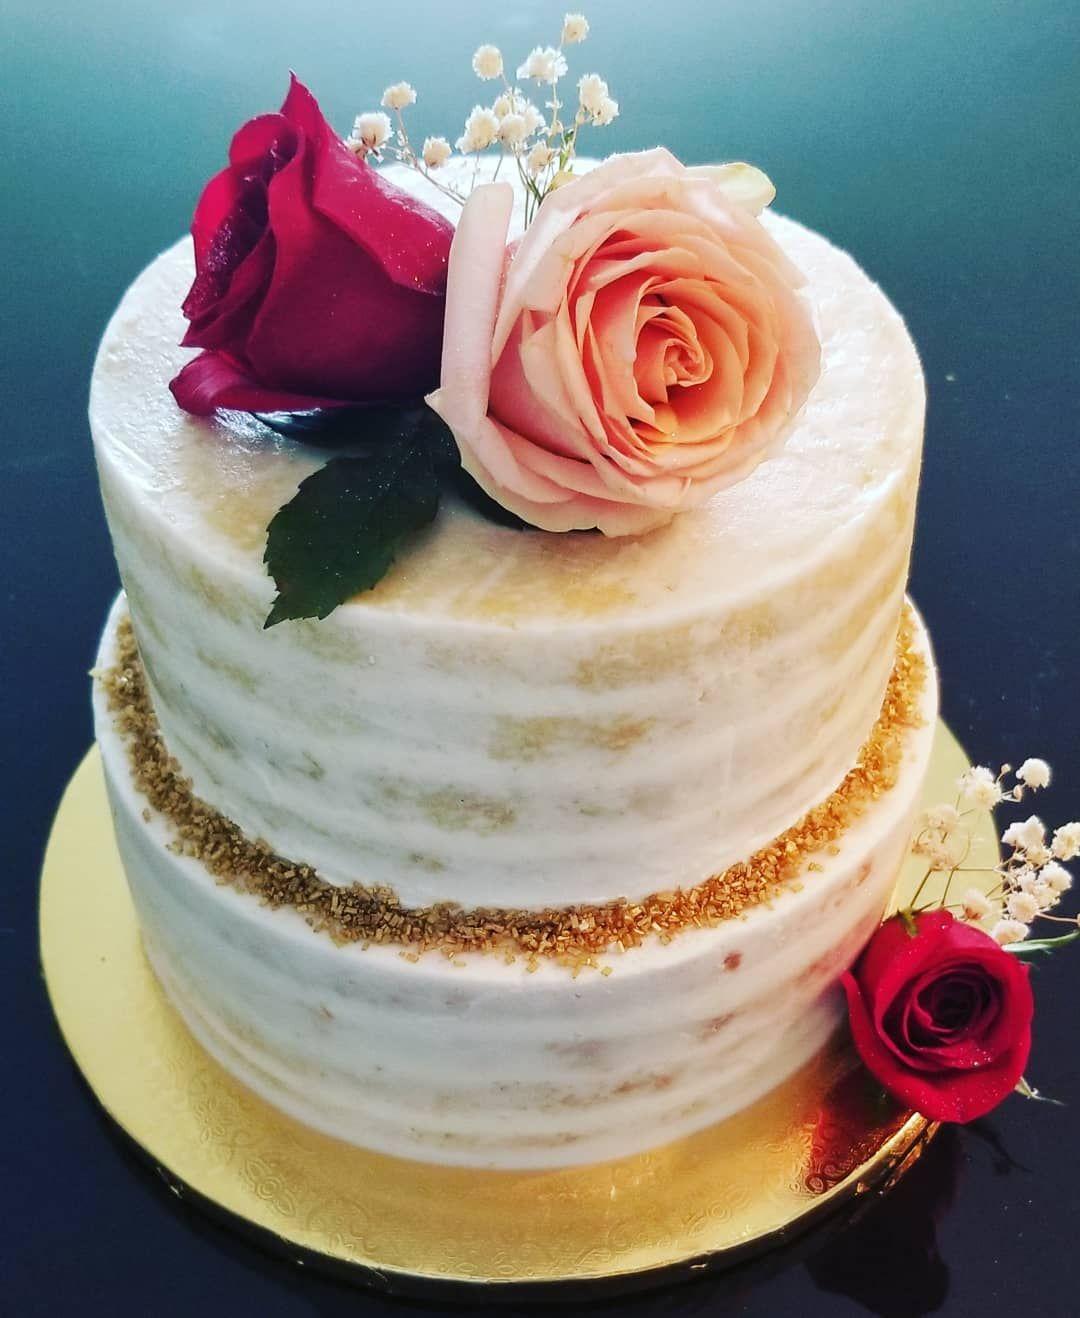 Rose Naked cake